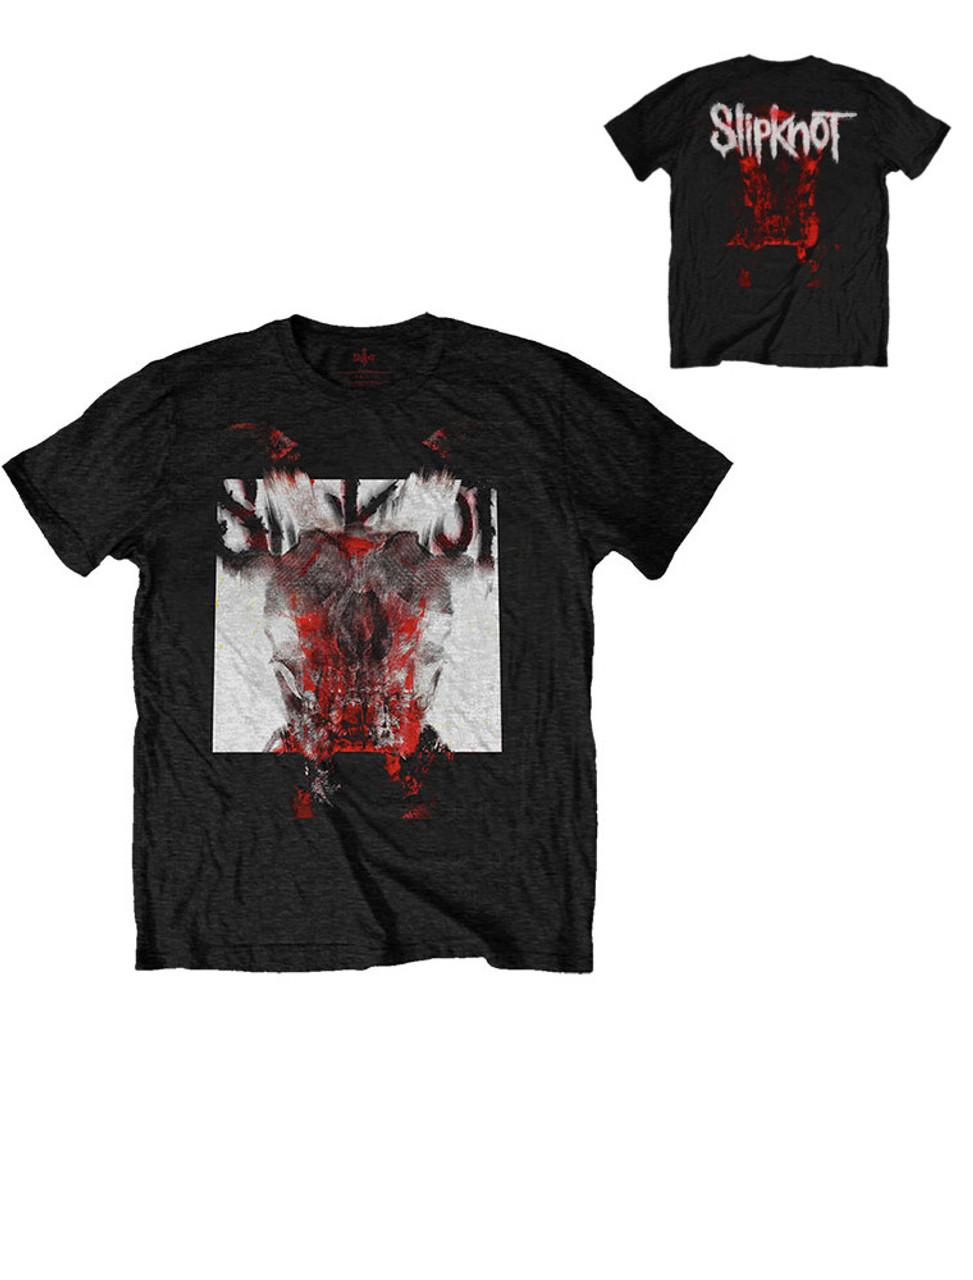 Slipknot All Out Life Unisex T-Shirt